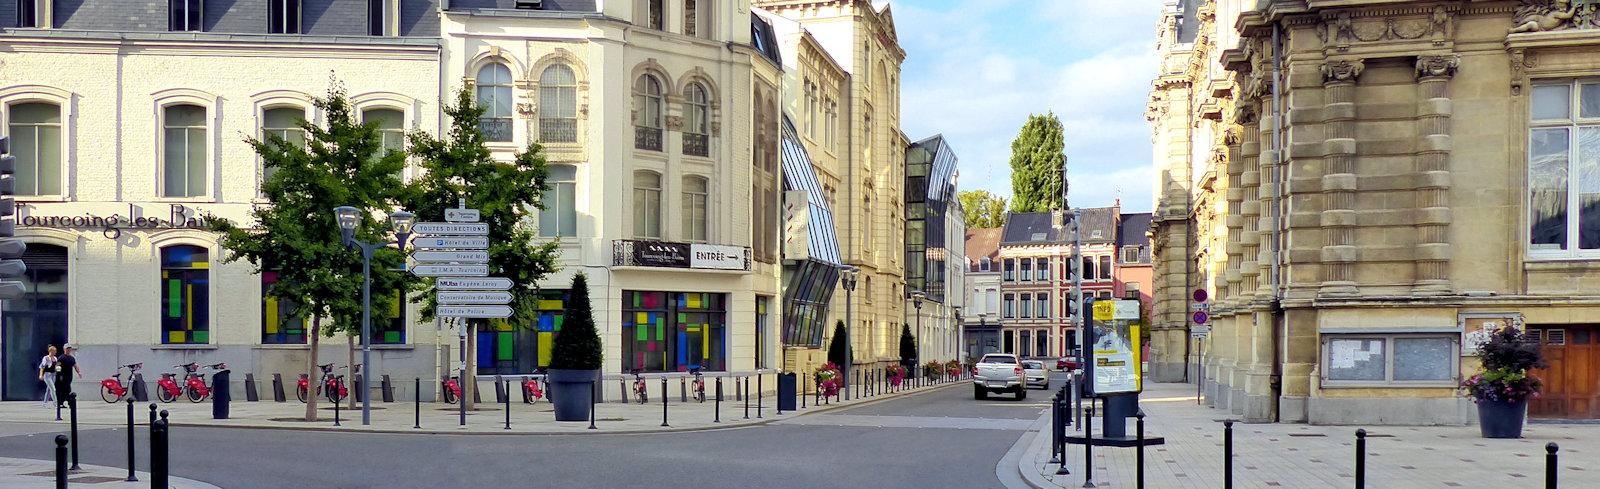 Station V'Lille - Tourcoing, Mairie